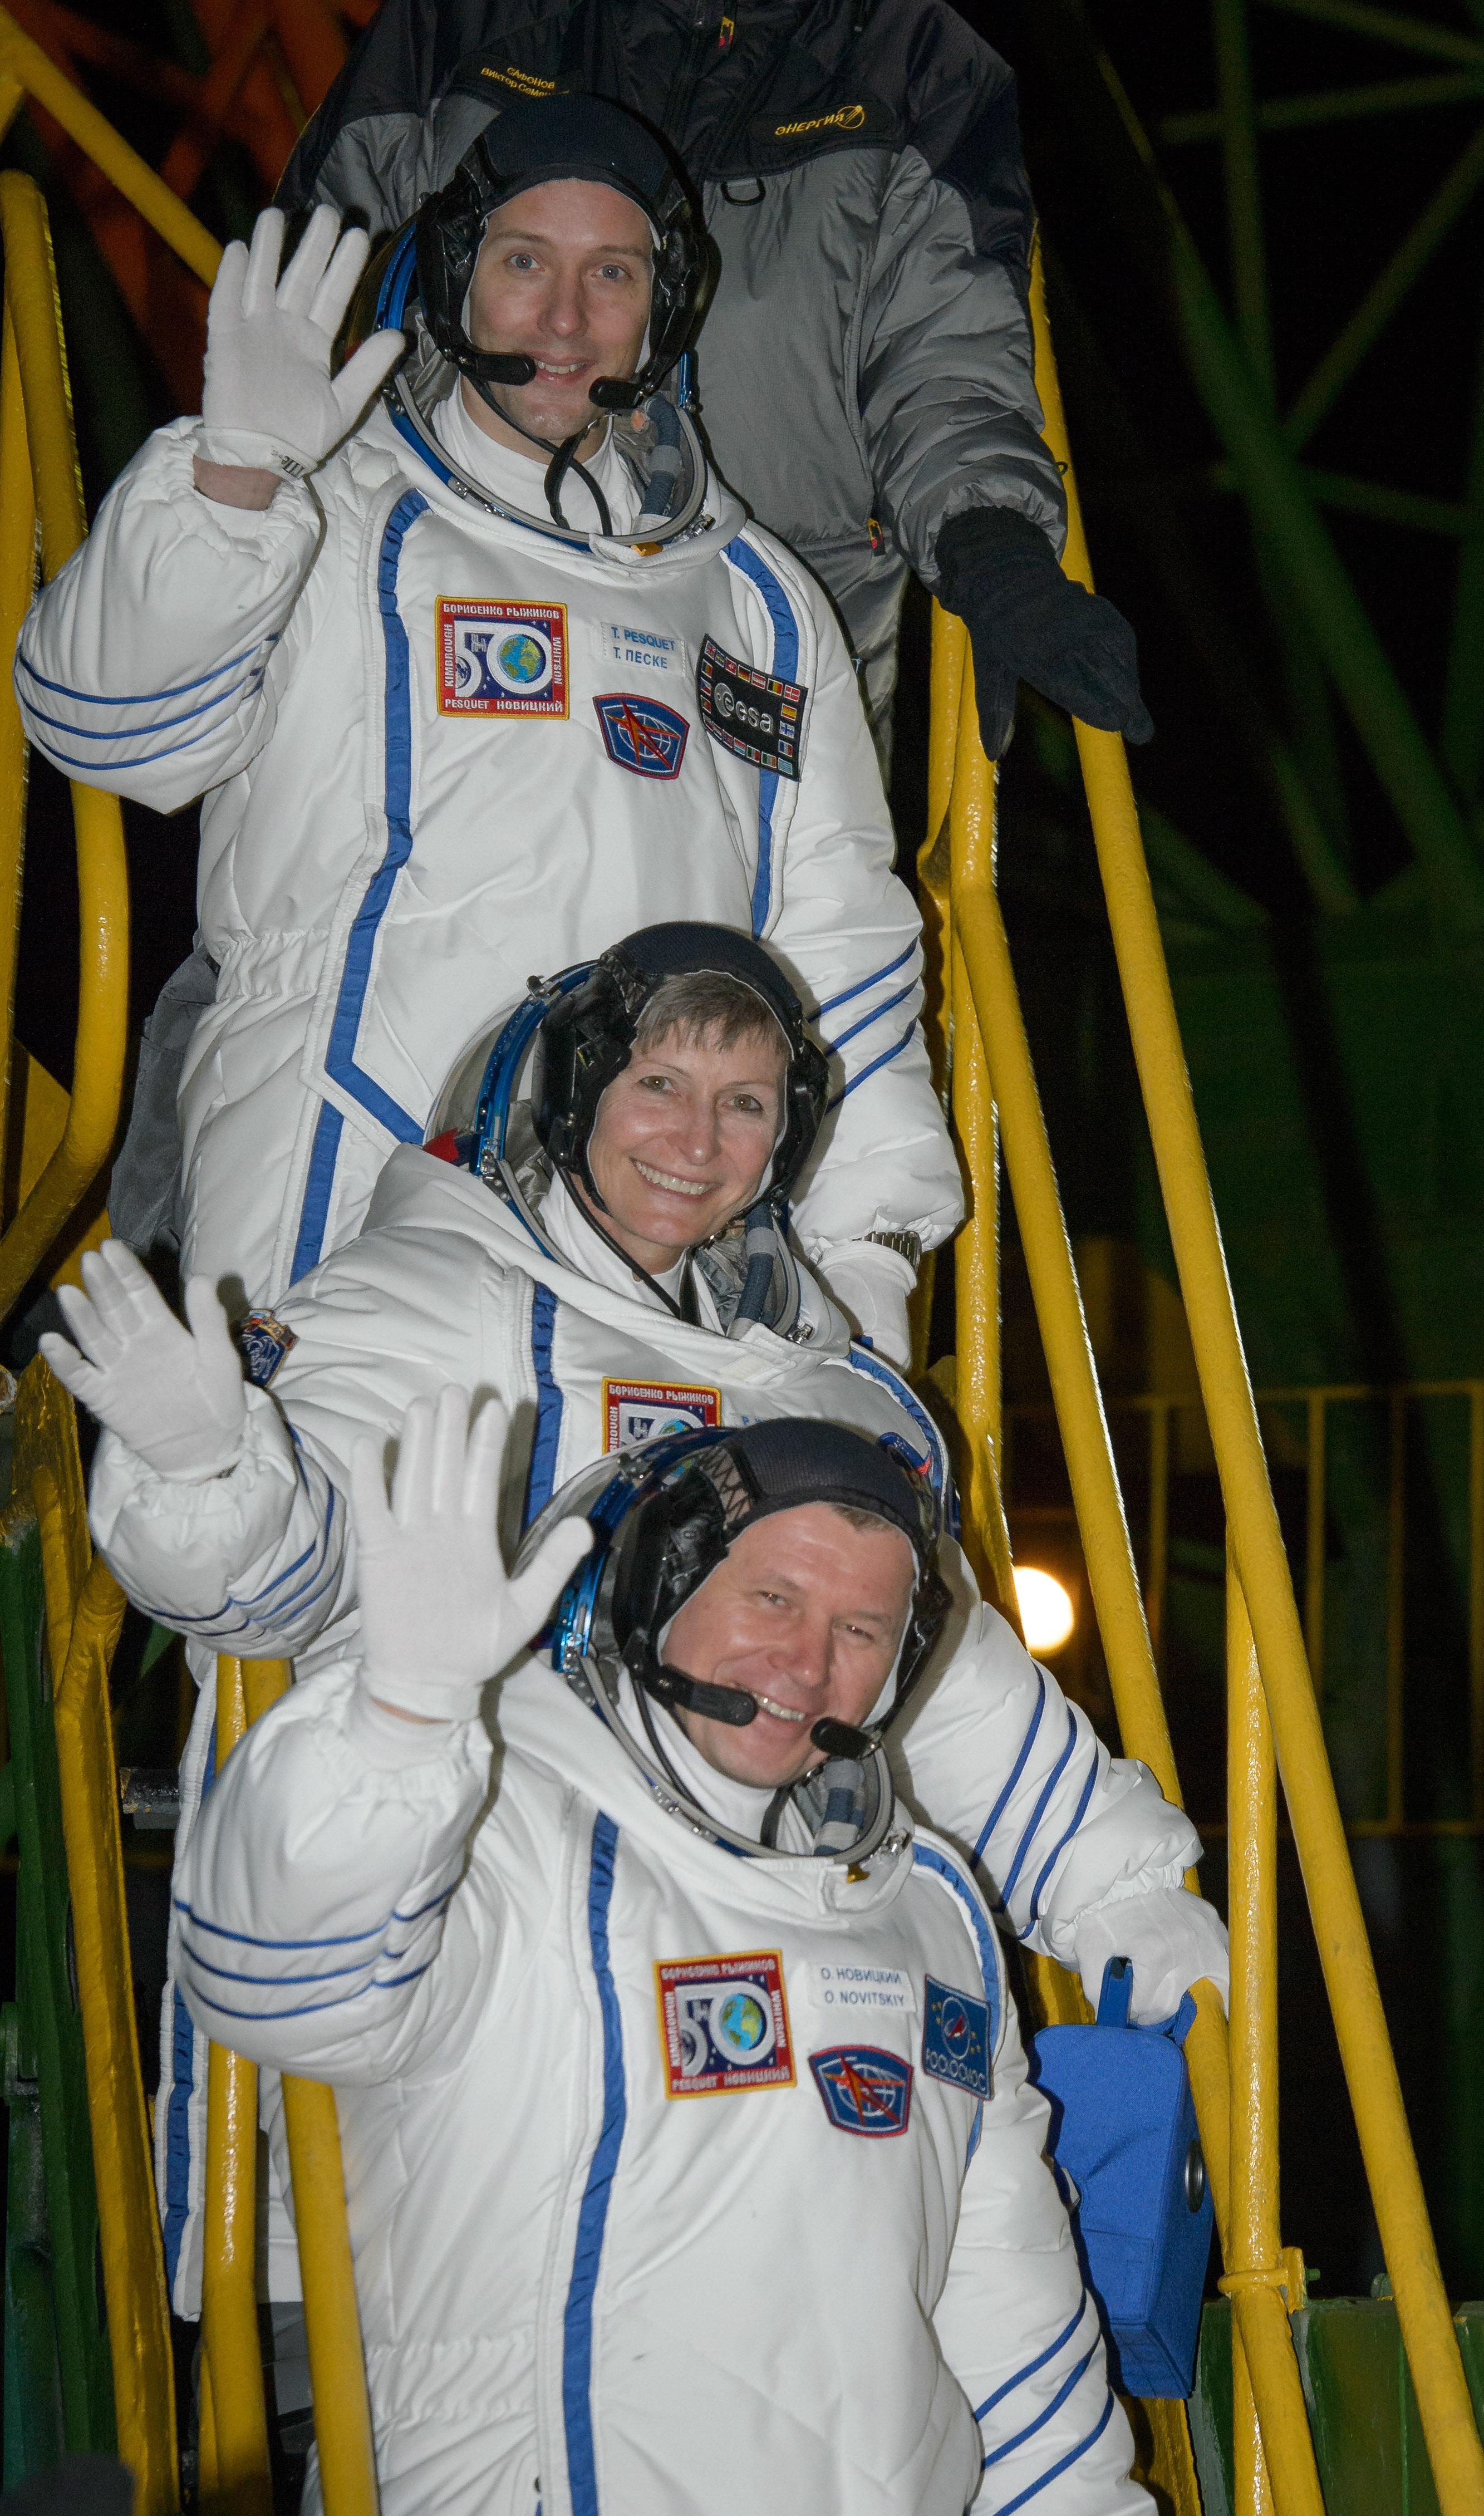 Soyuz MS-03 crew before launch